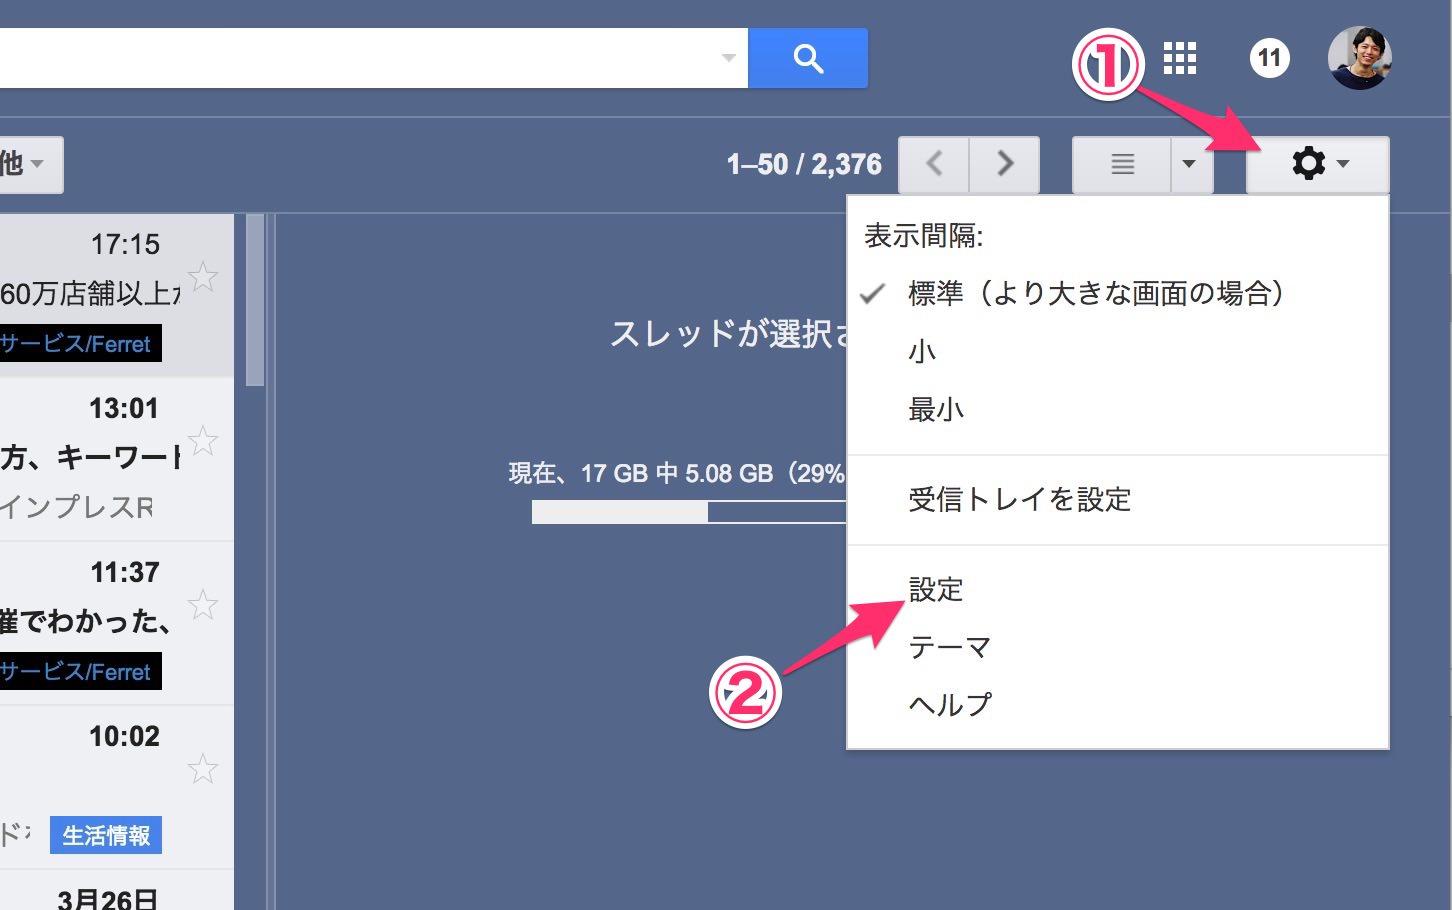 gmail-4-star_icon1